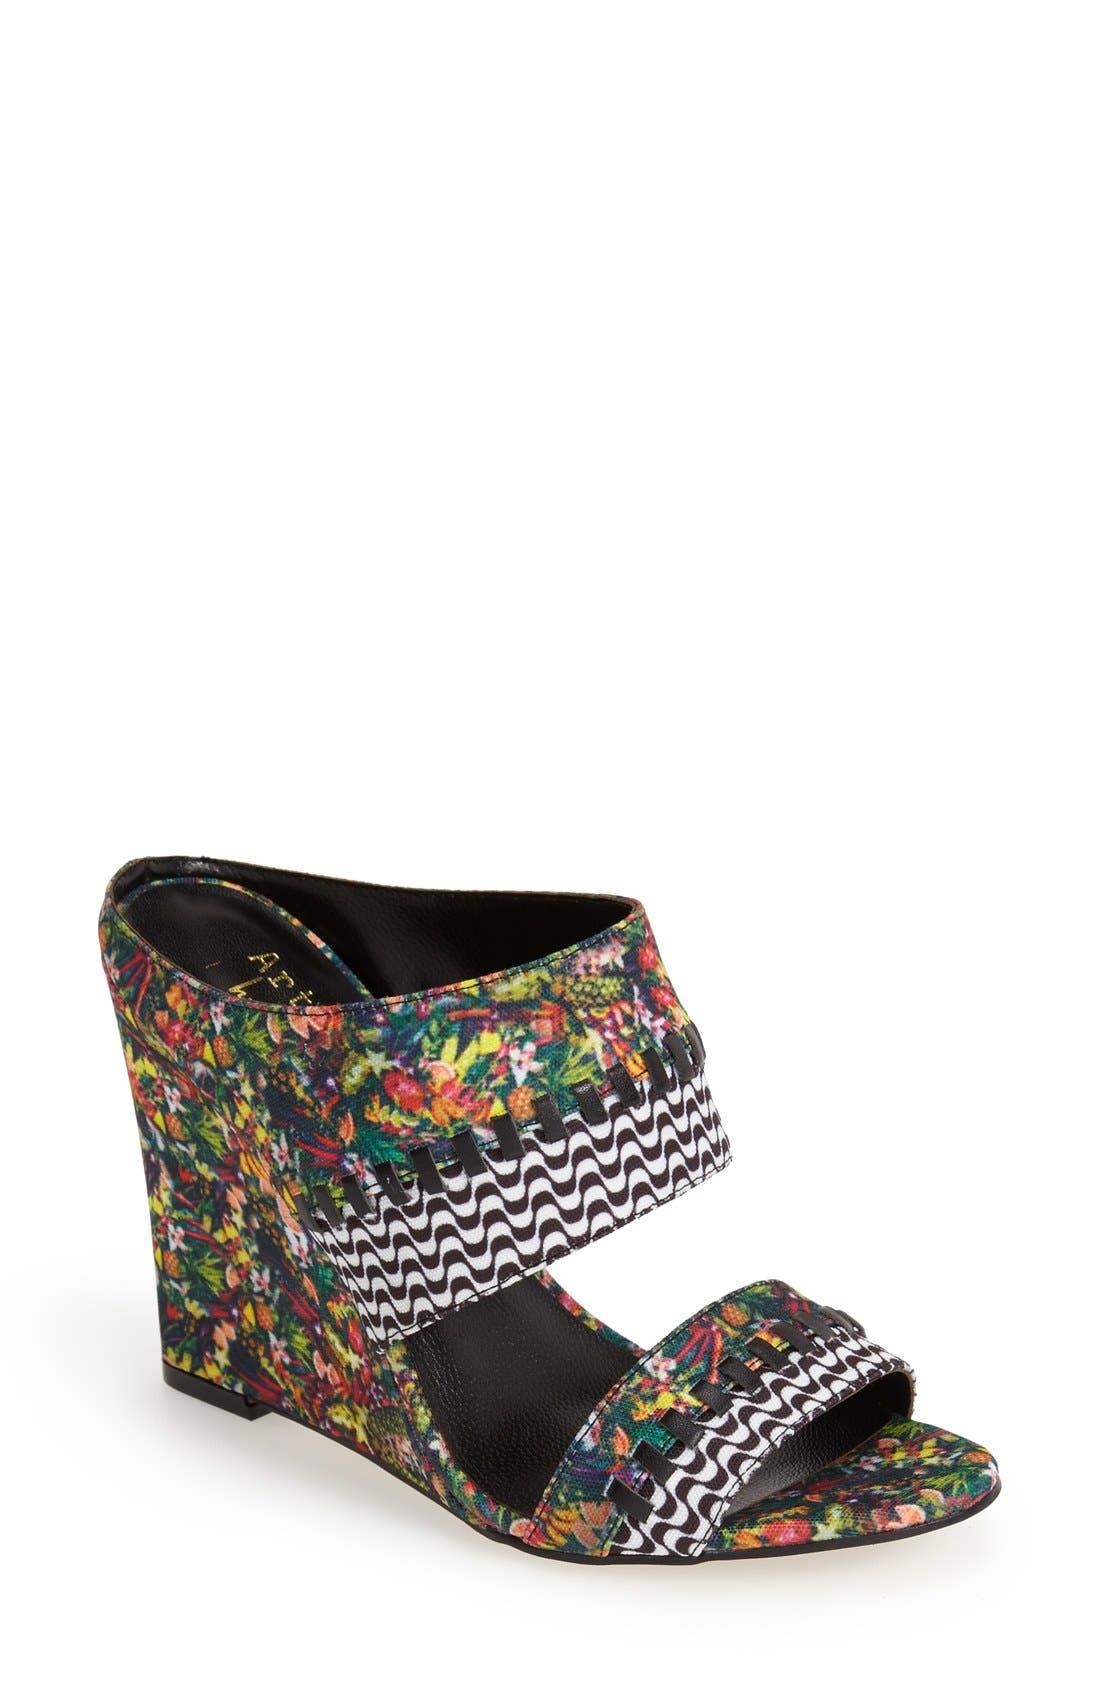 Main Image - Nicole Miller 'Orlando' Wedge Sandal (Women)